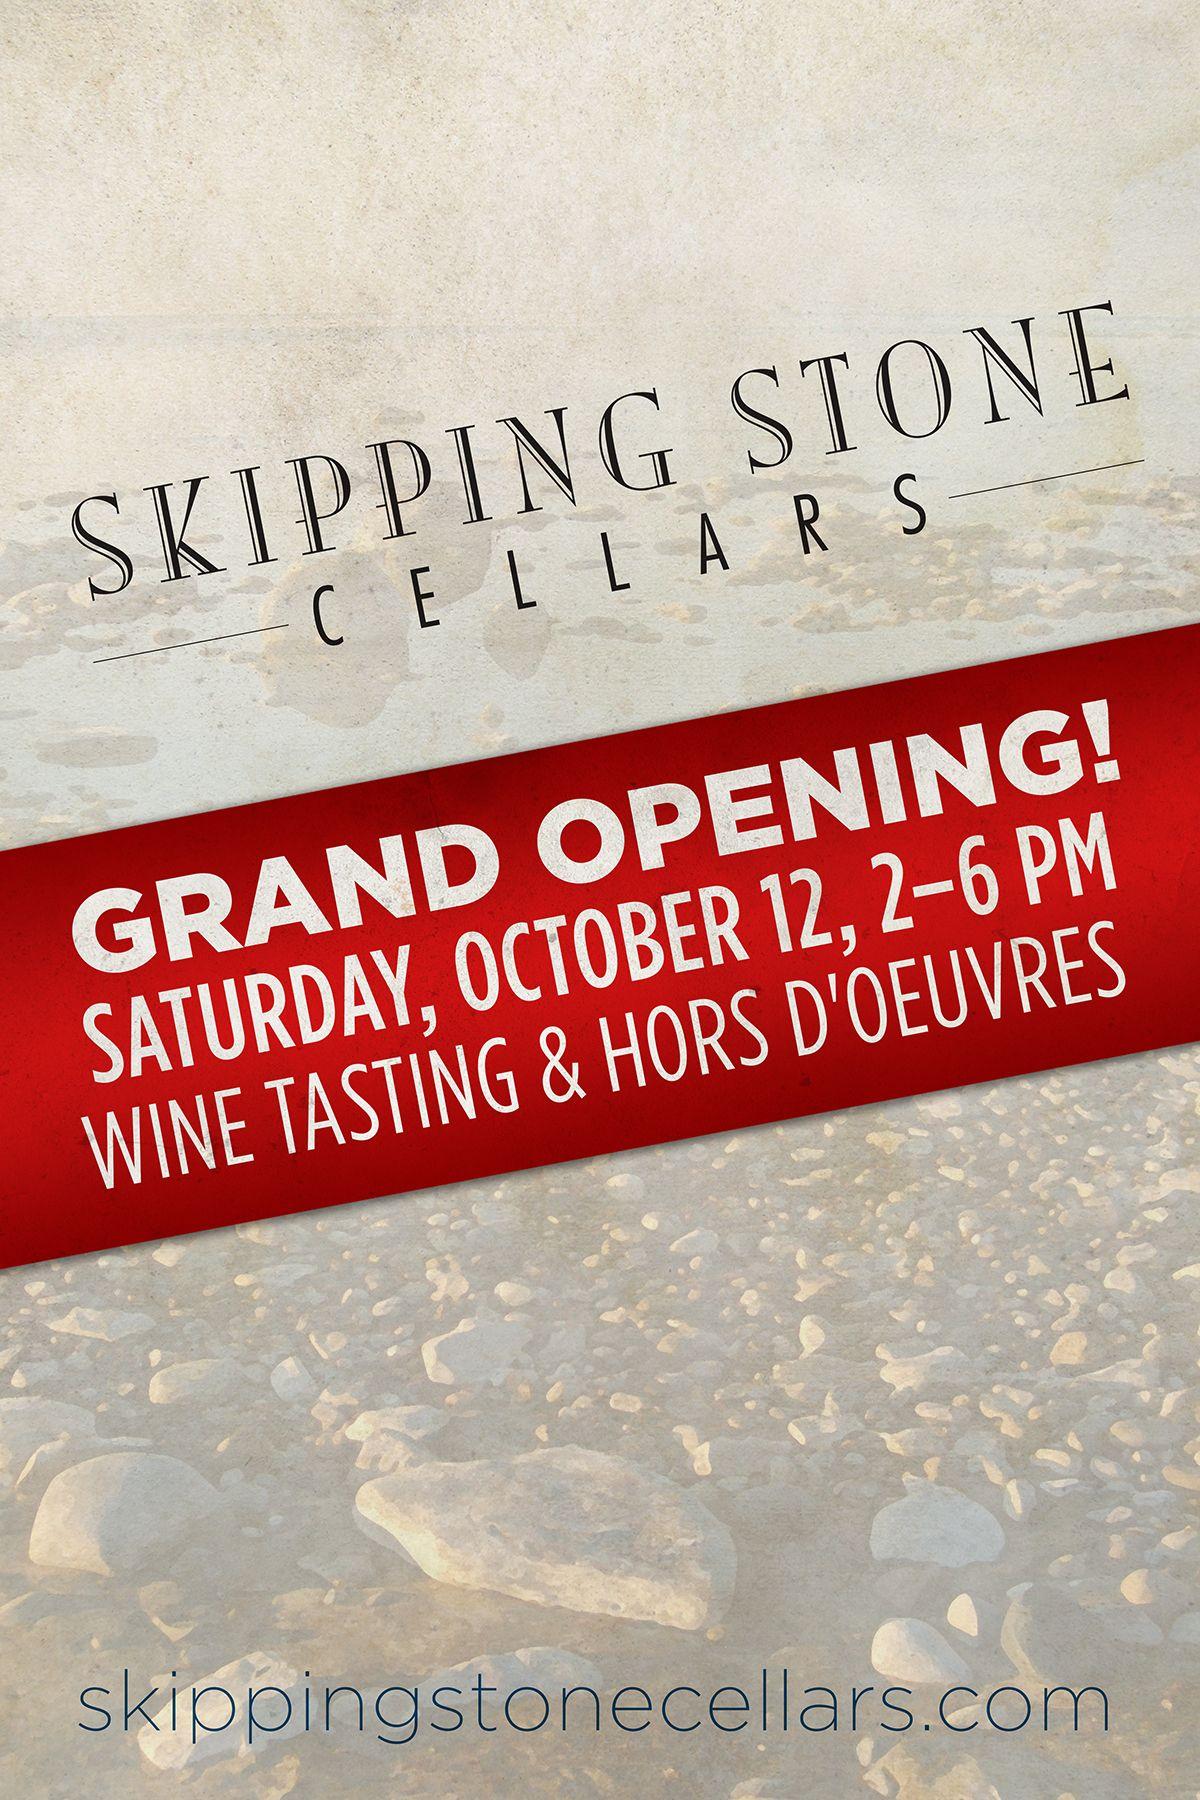 Leelanau Peninsula Winery Grand Opening Skipping Stone Cellars In Suttons Bay Michigan Winery Winetasting Traversecity Leelanau Suttons Bay Grand Opening